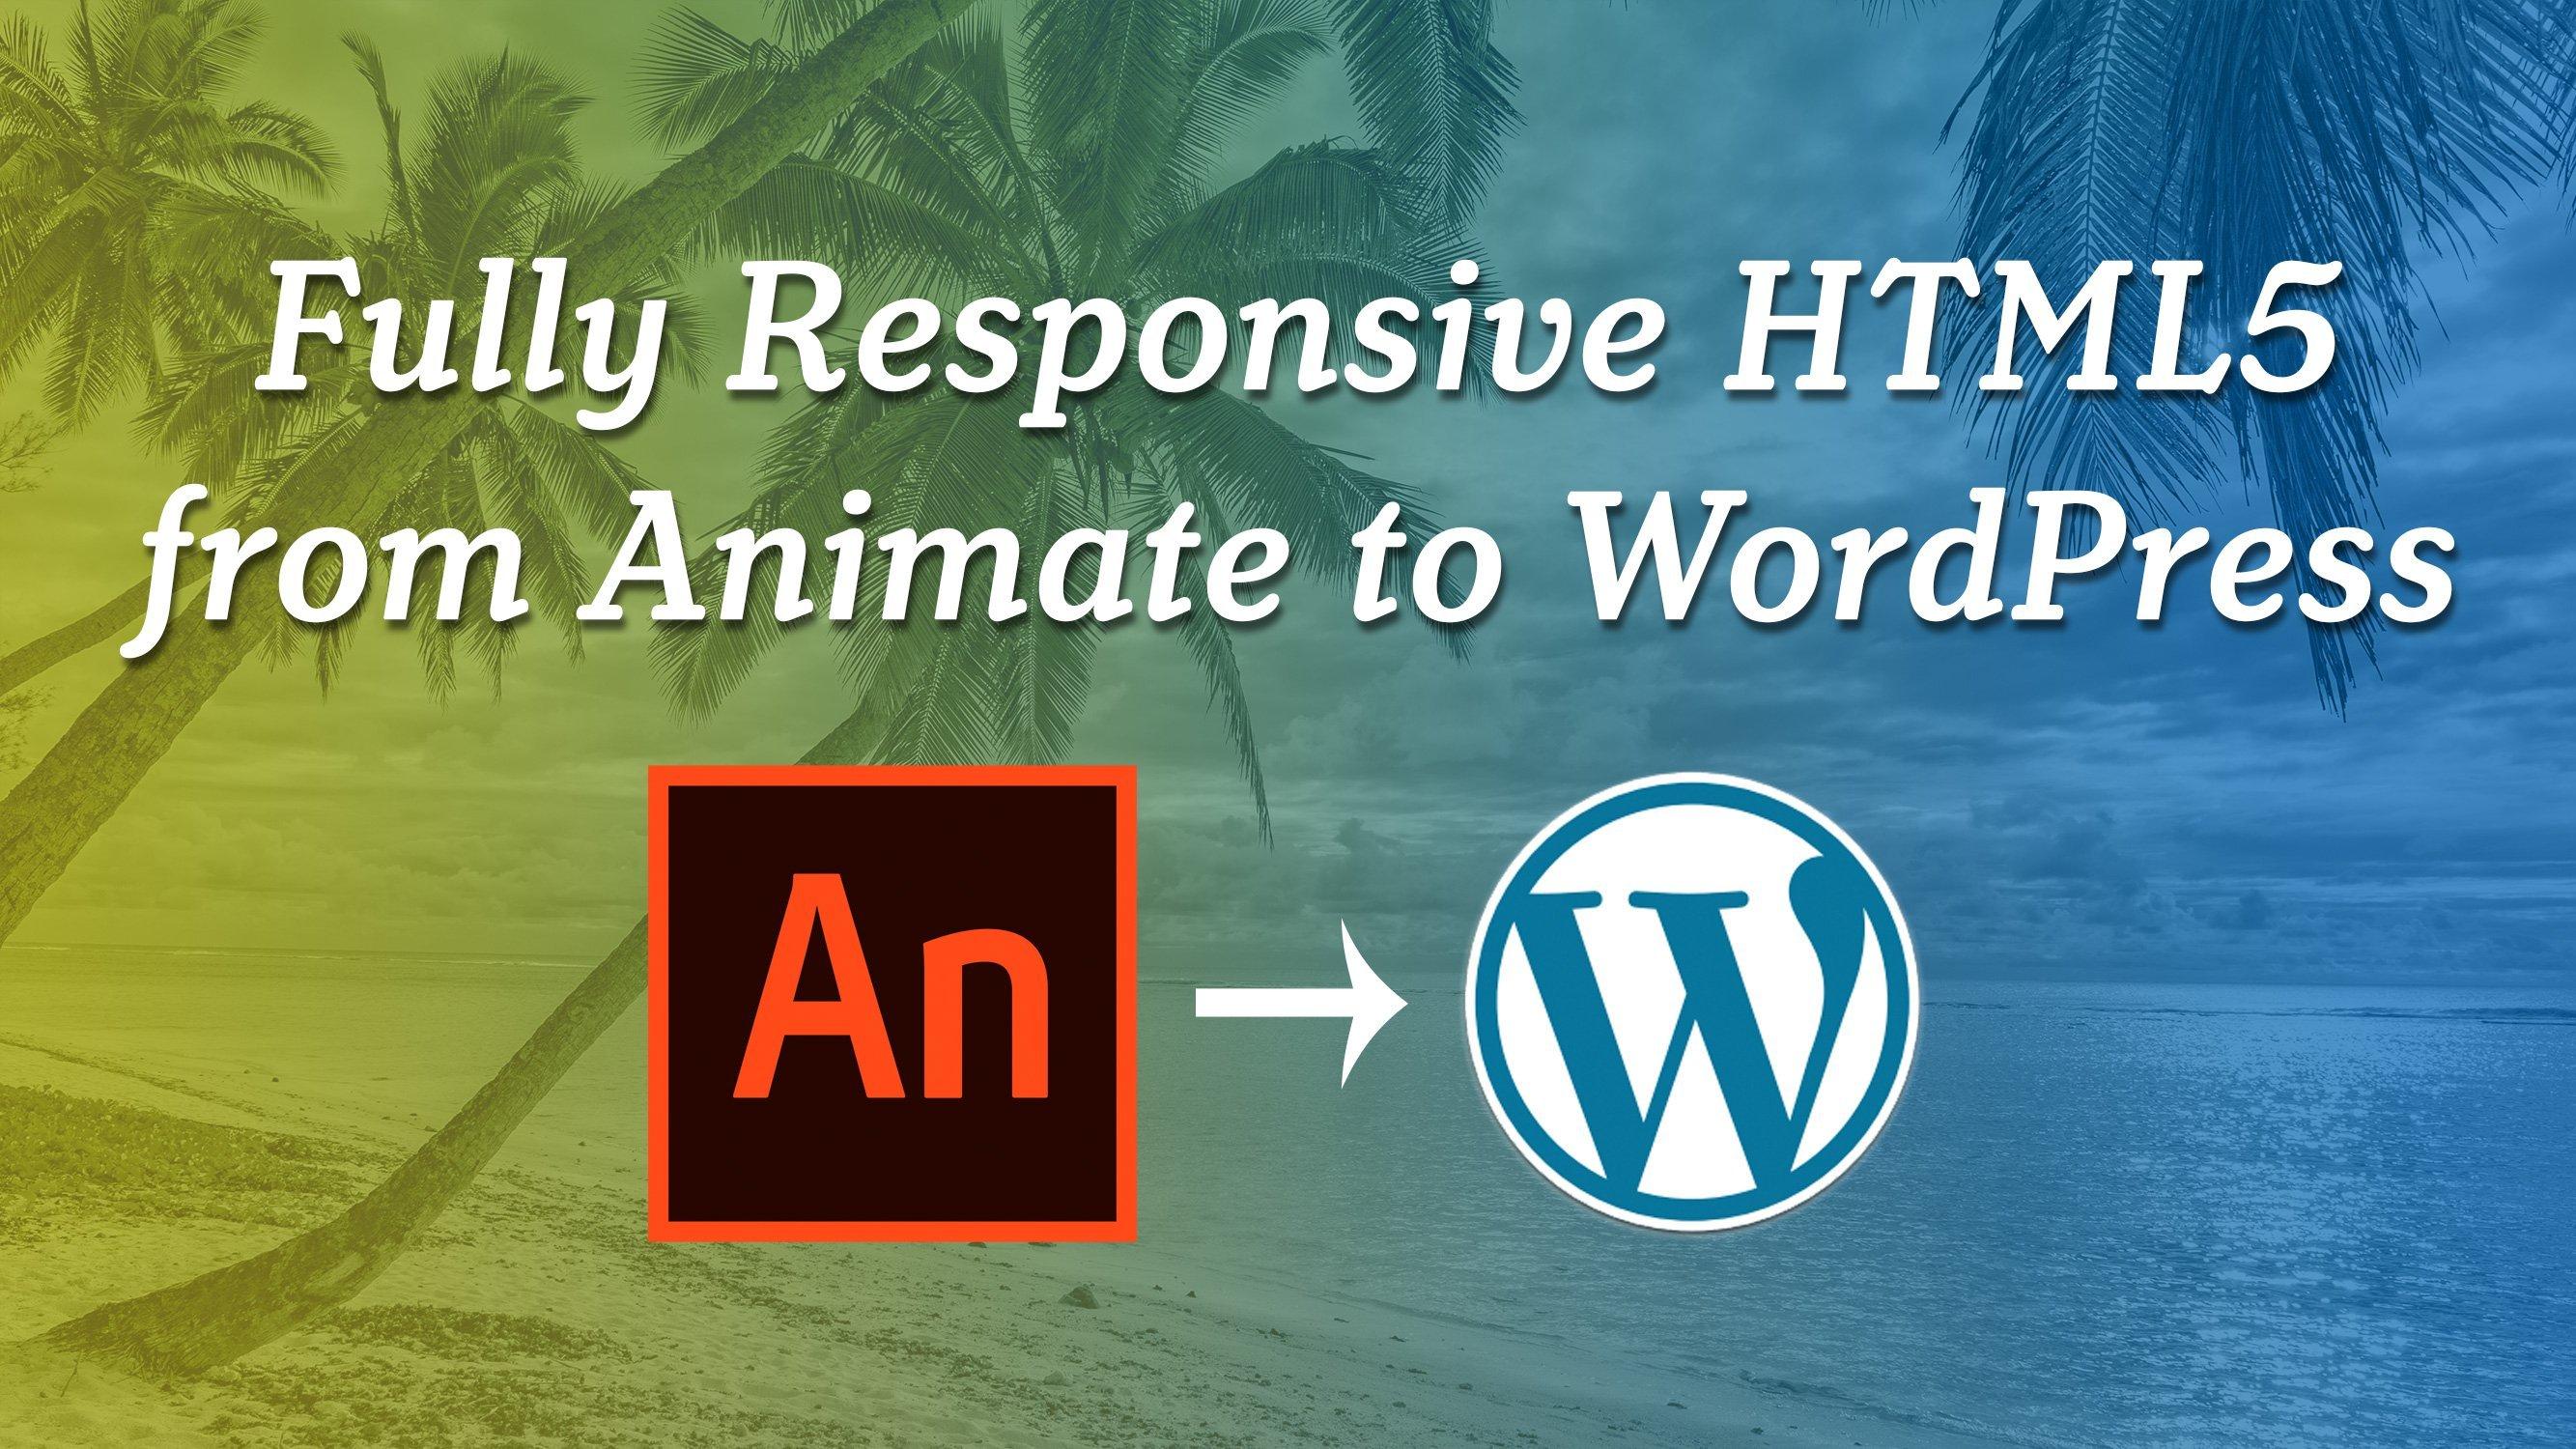 How to make Adobe Animate CC 2019 HTML5 Canvas Responsive on WordPress